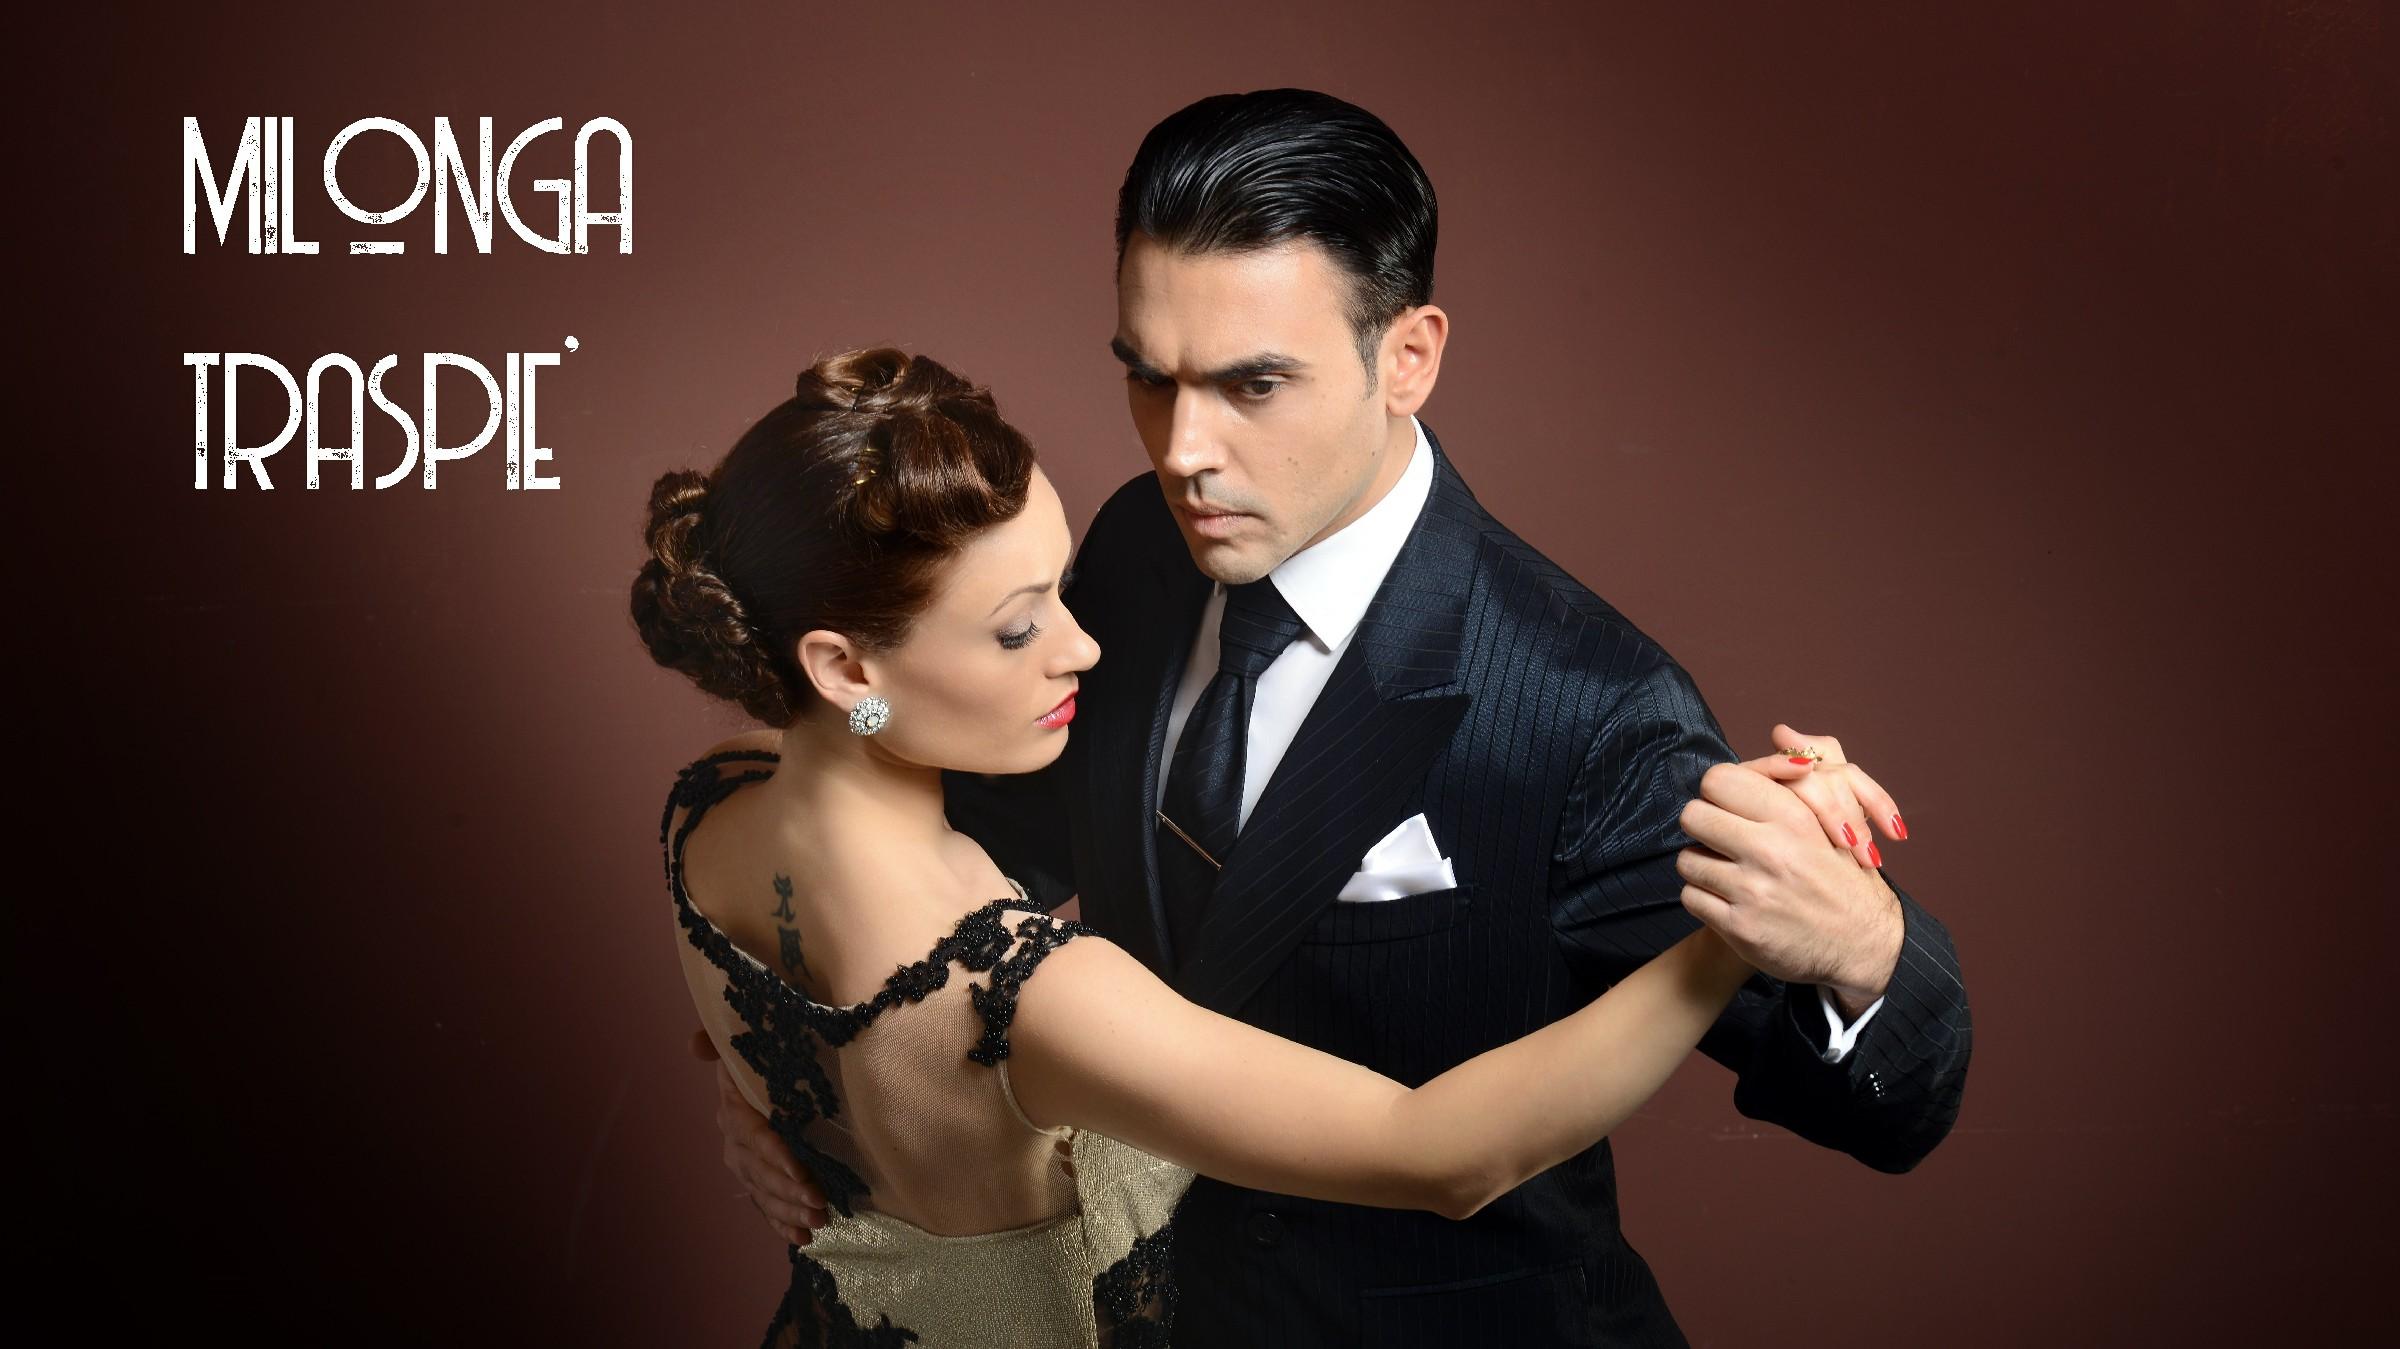 stage-milonga-tango-loft-elisa-donatello